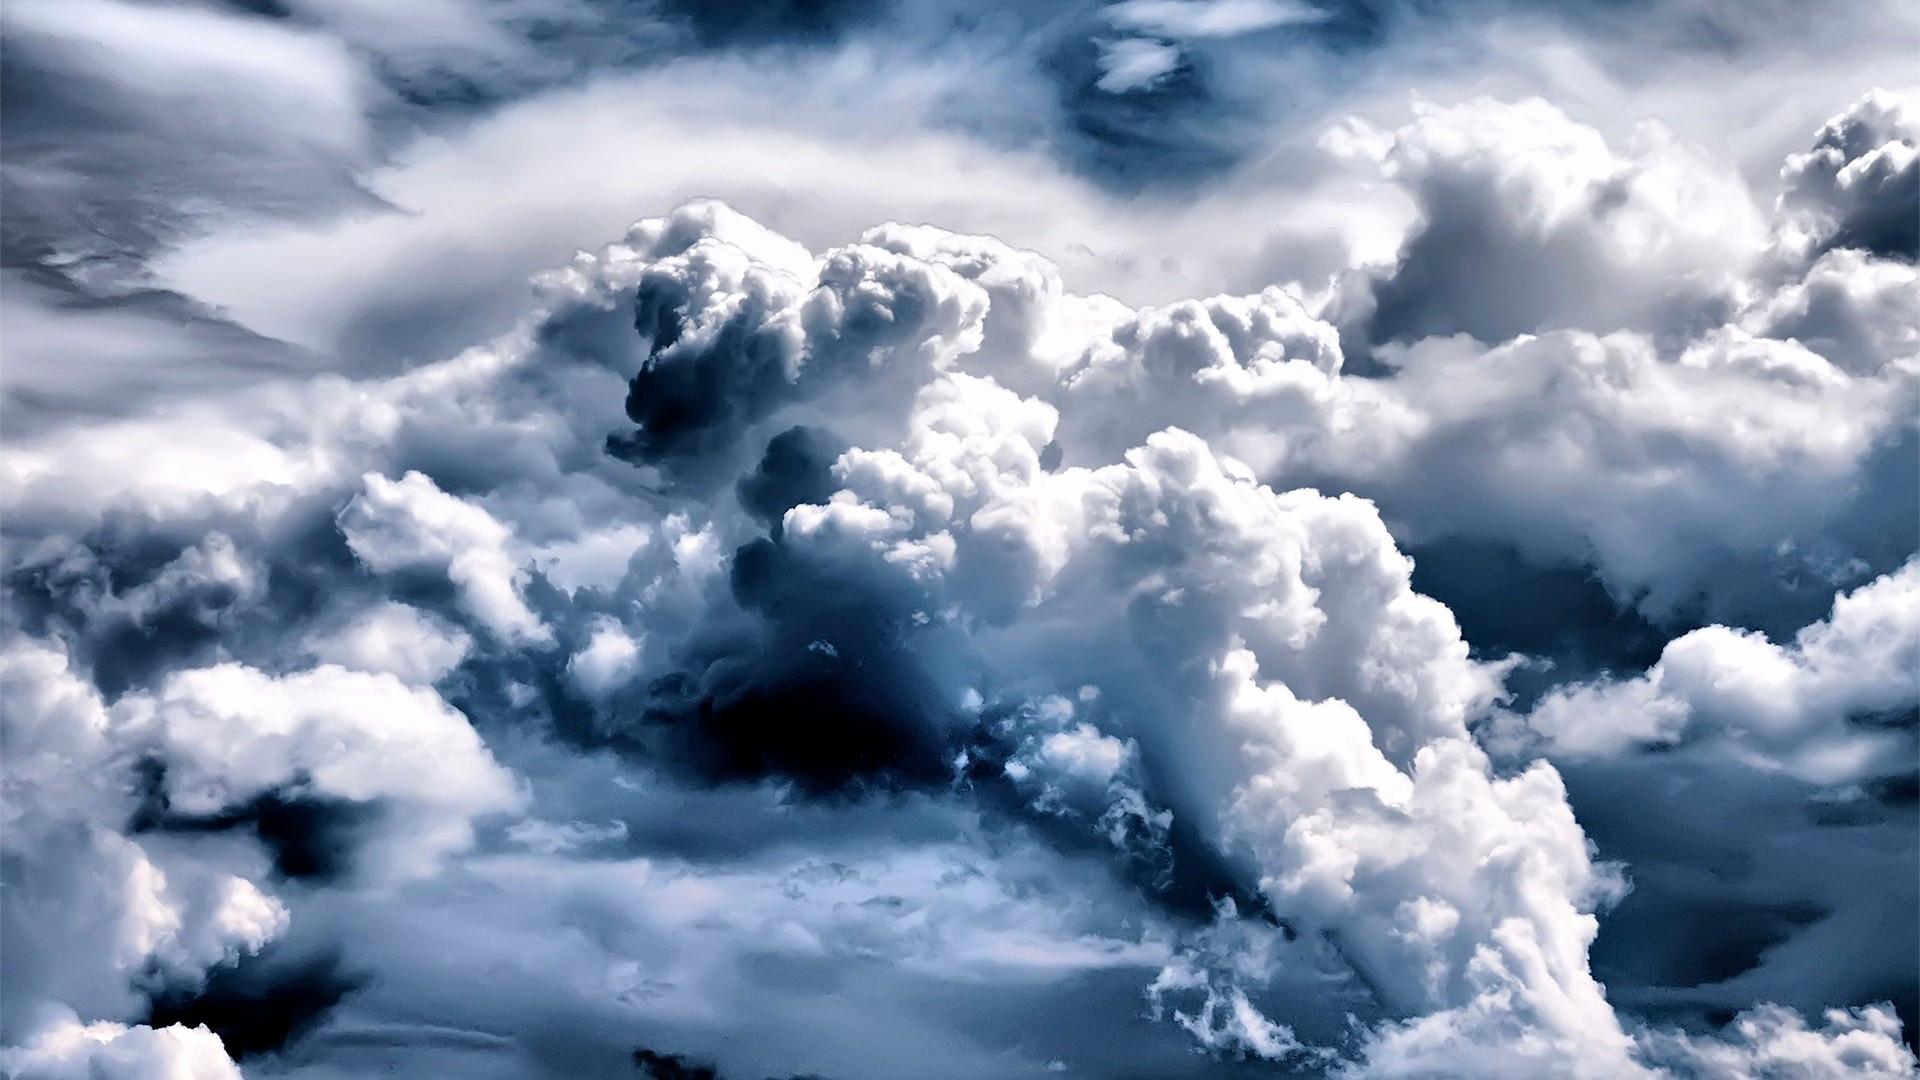 Res: 1920x1080, Cloud Wallpaper Beautiful Wallpaper Clouds Sky 62 Images